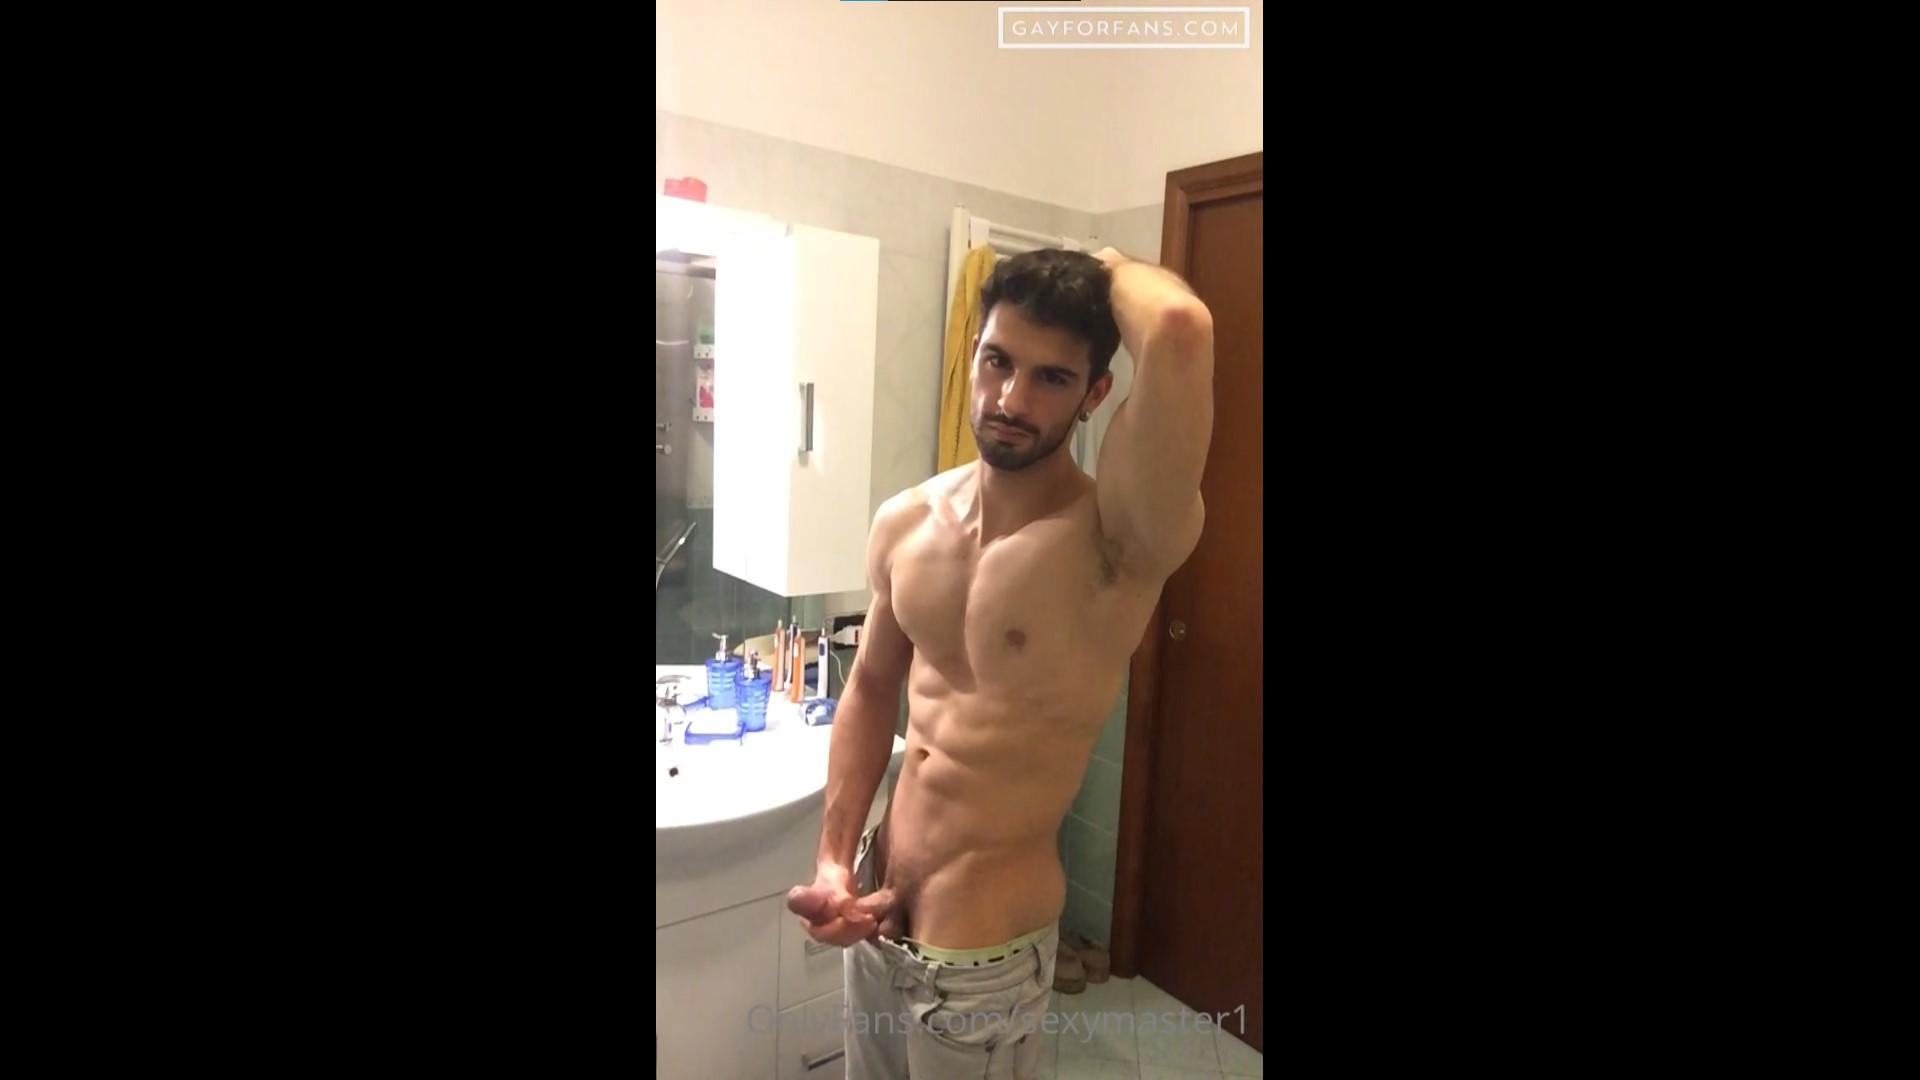 Quick bathroom jerk off - Katoptris